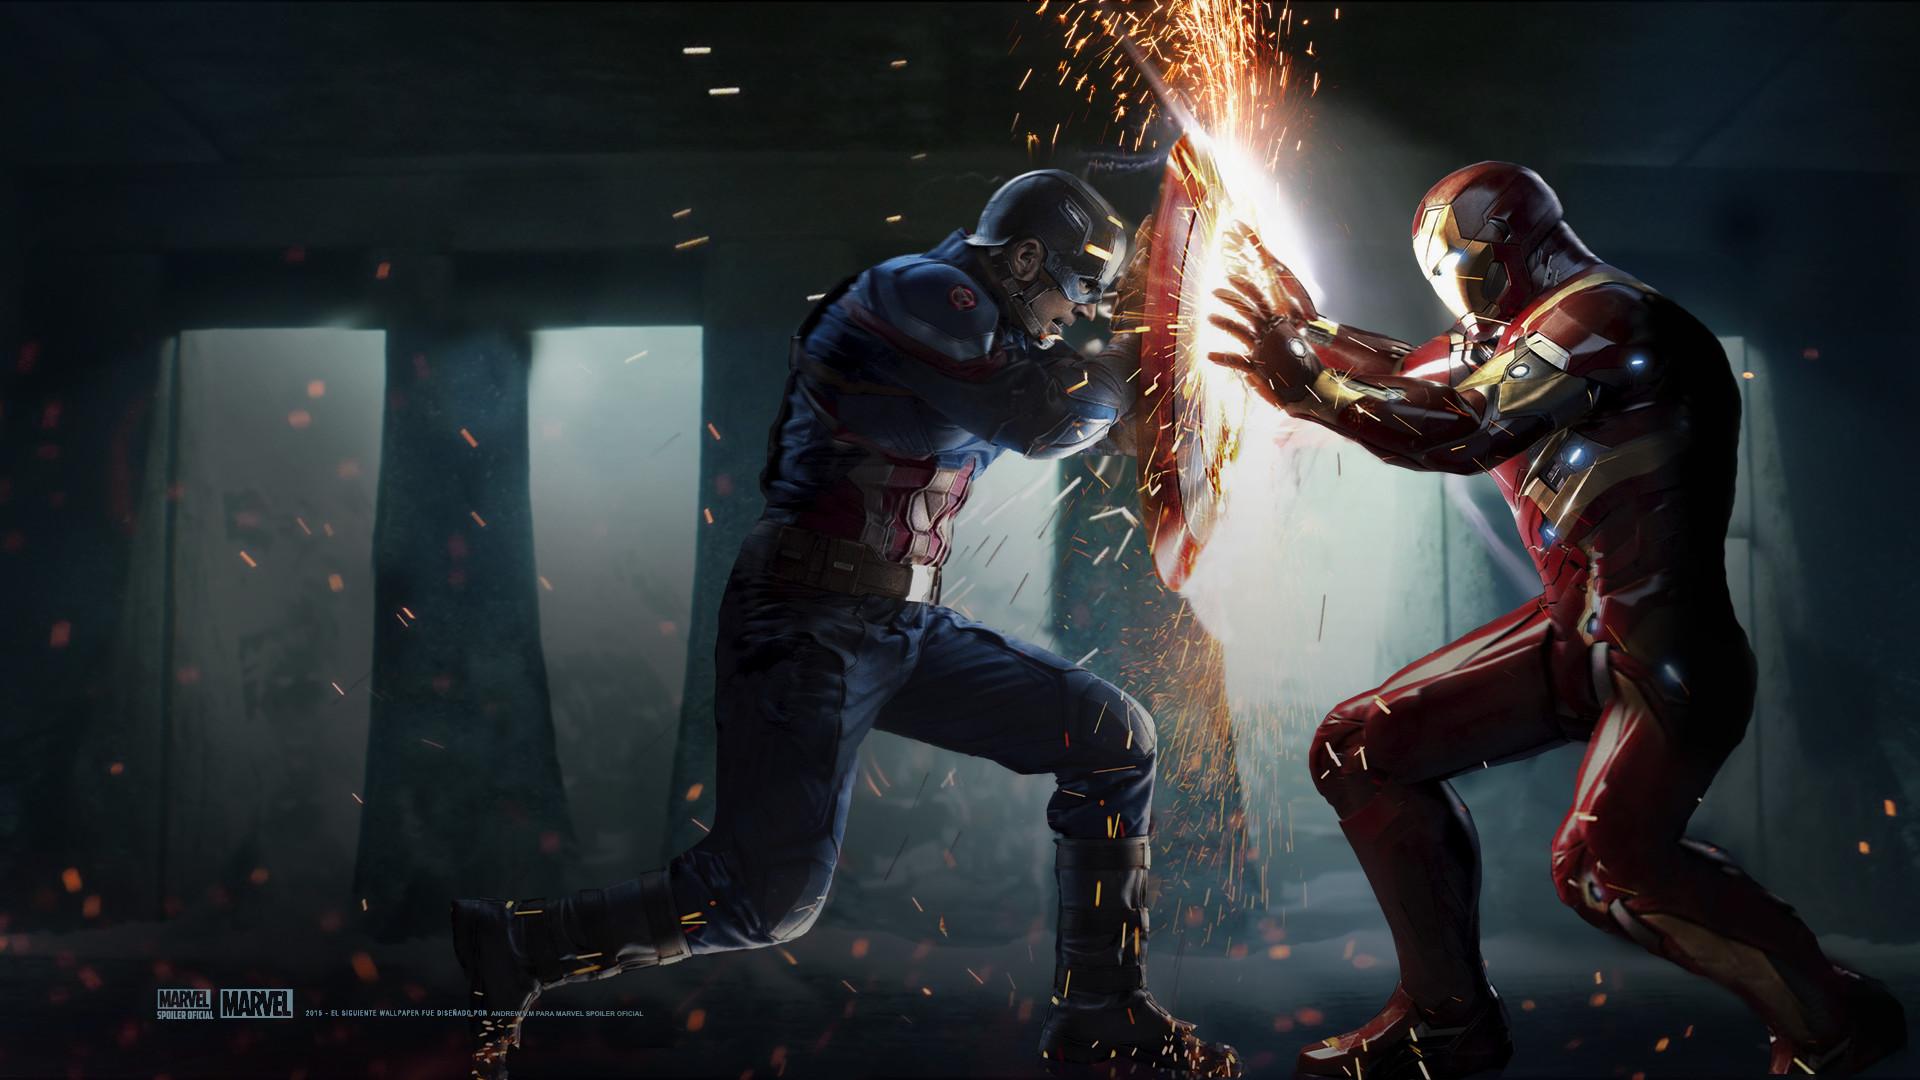 Avengers civil war wallpaper 72 images - Avengers civil war wallpaper ...